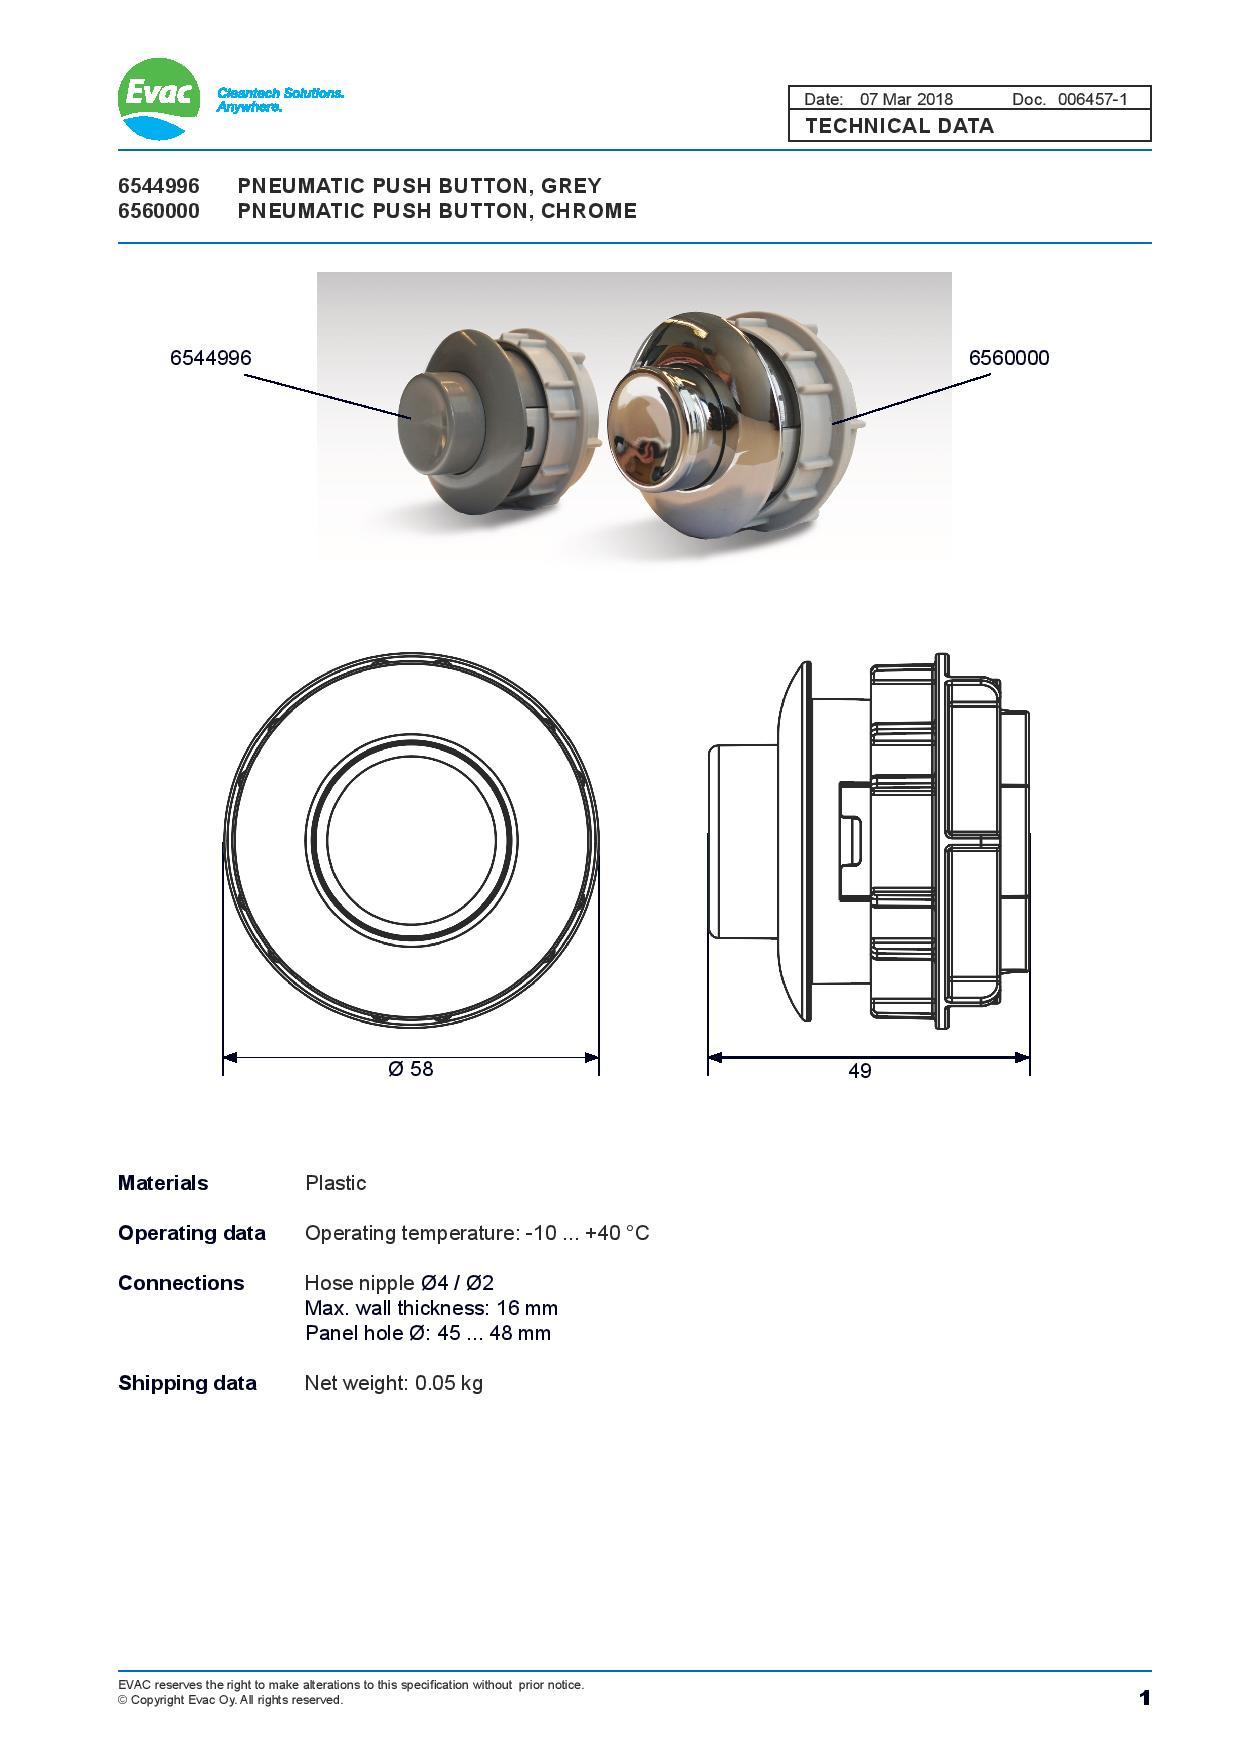 Evac Vacuum Toilet 6560000 and 6544996 Pneumatic Push Buttons